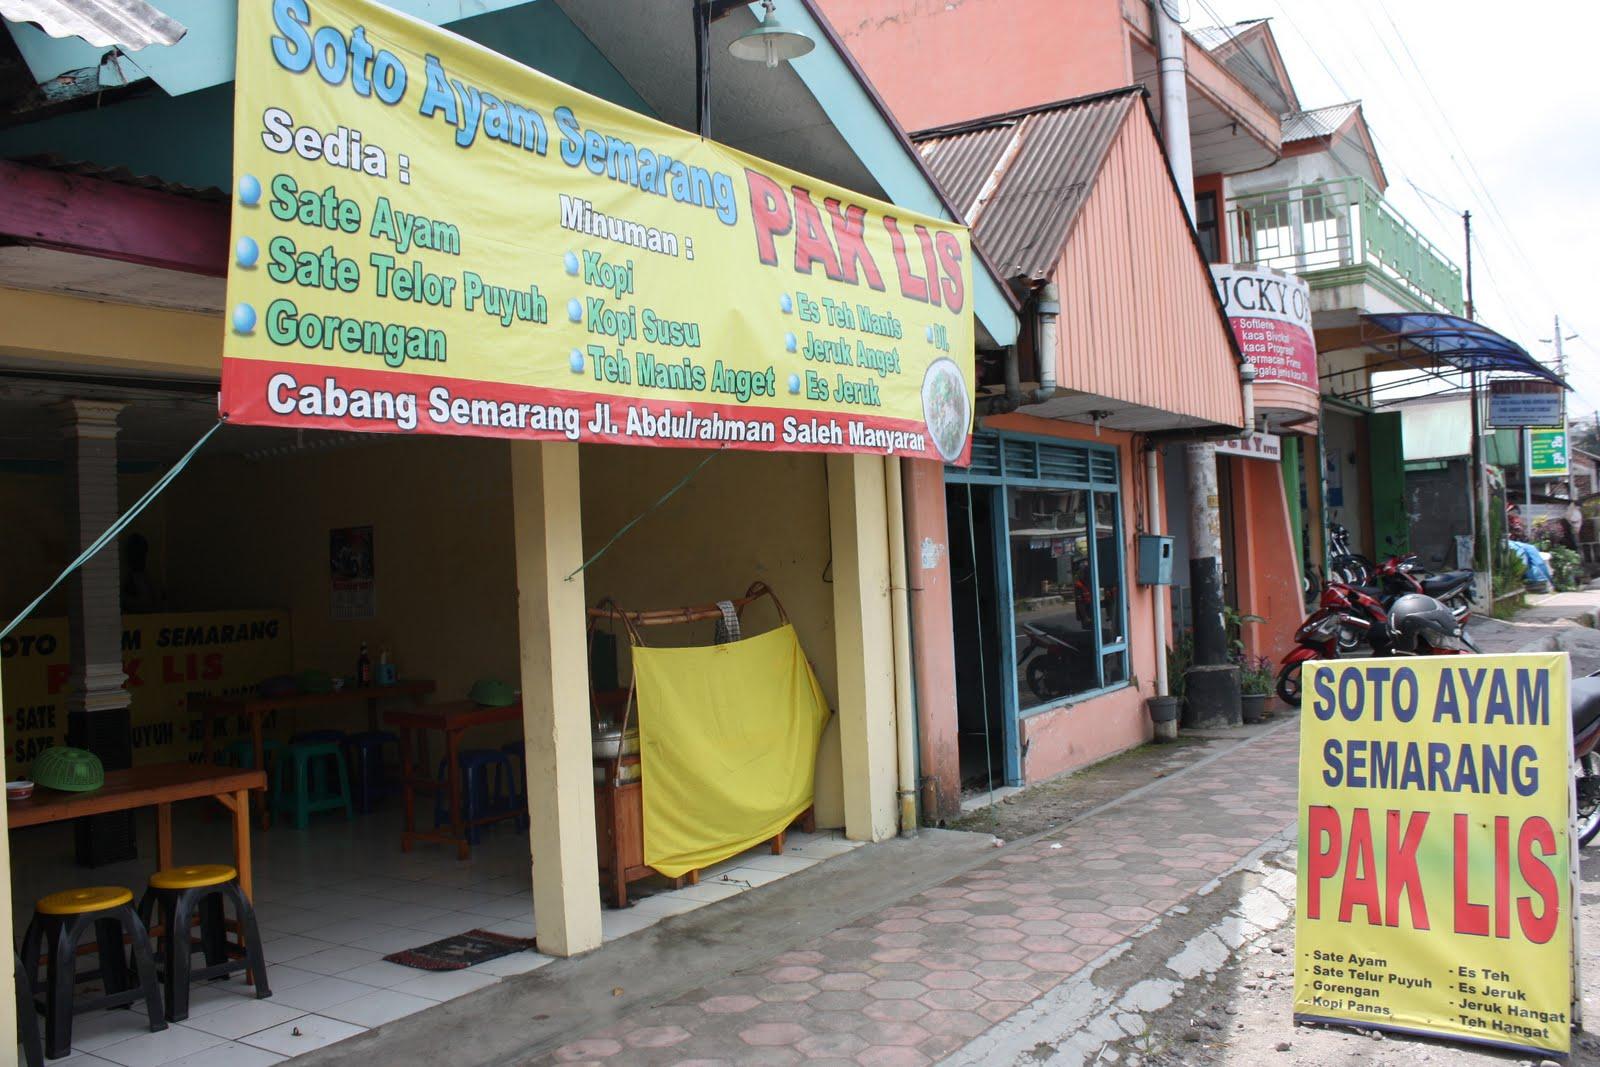 Blognya Kertek Wonosobo Kuliner Citarasa Semarangan Kebetulan Melintas Daerah Tak